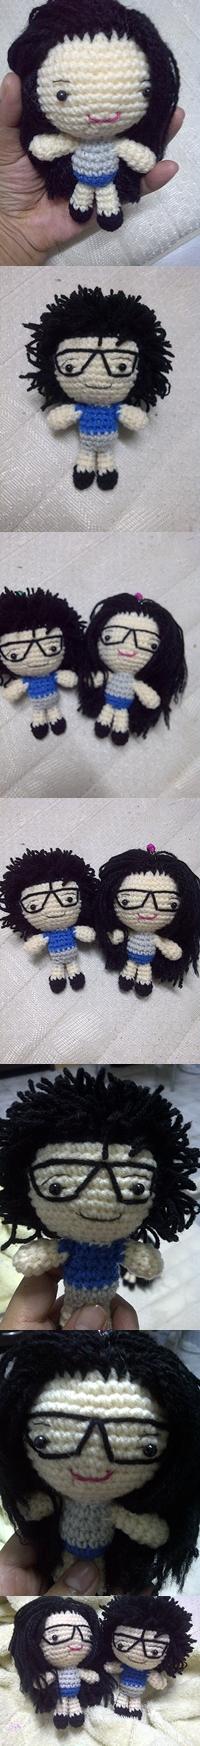 couple dolls crochet by me